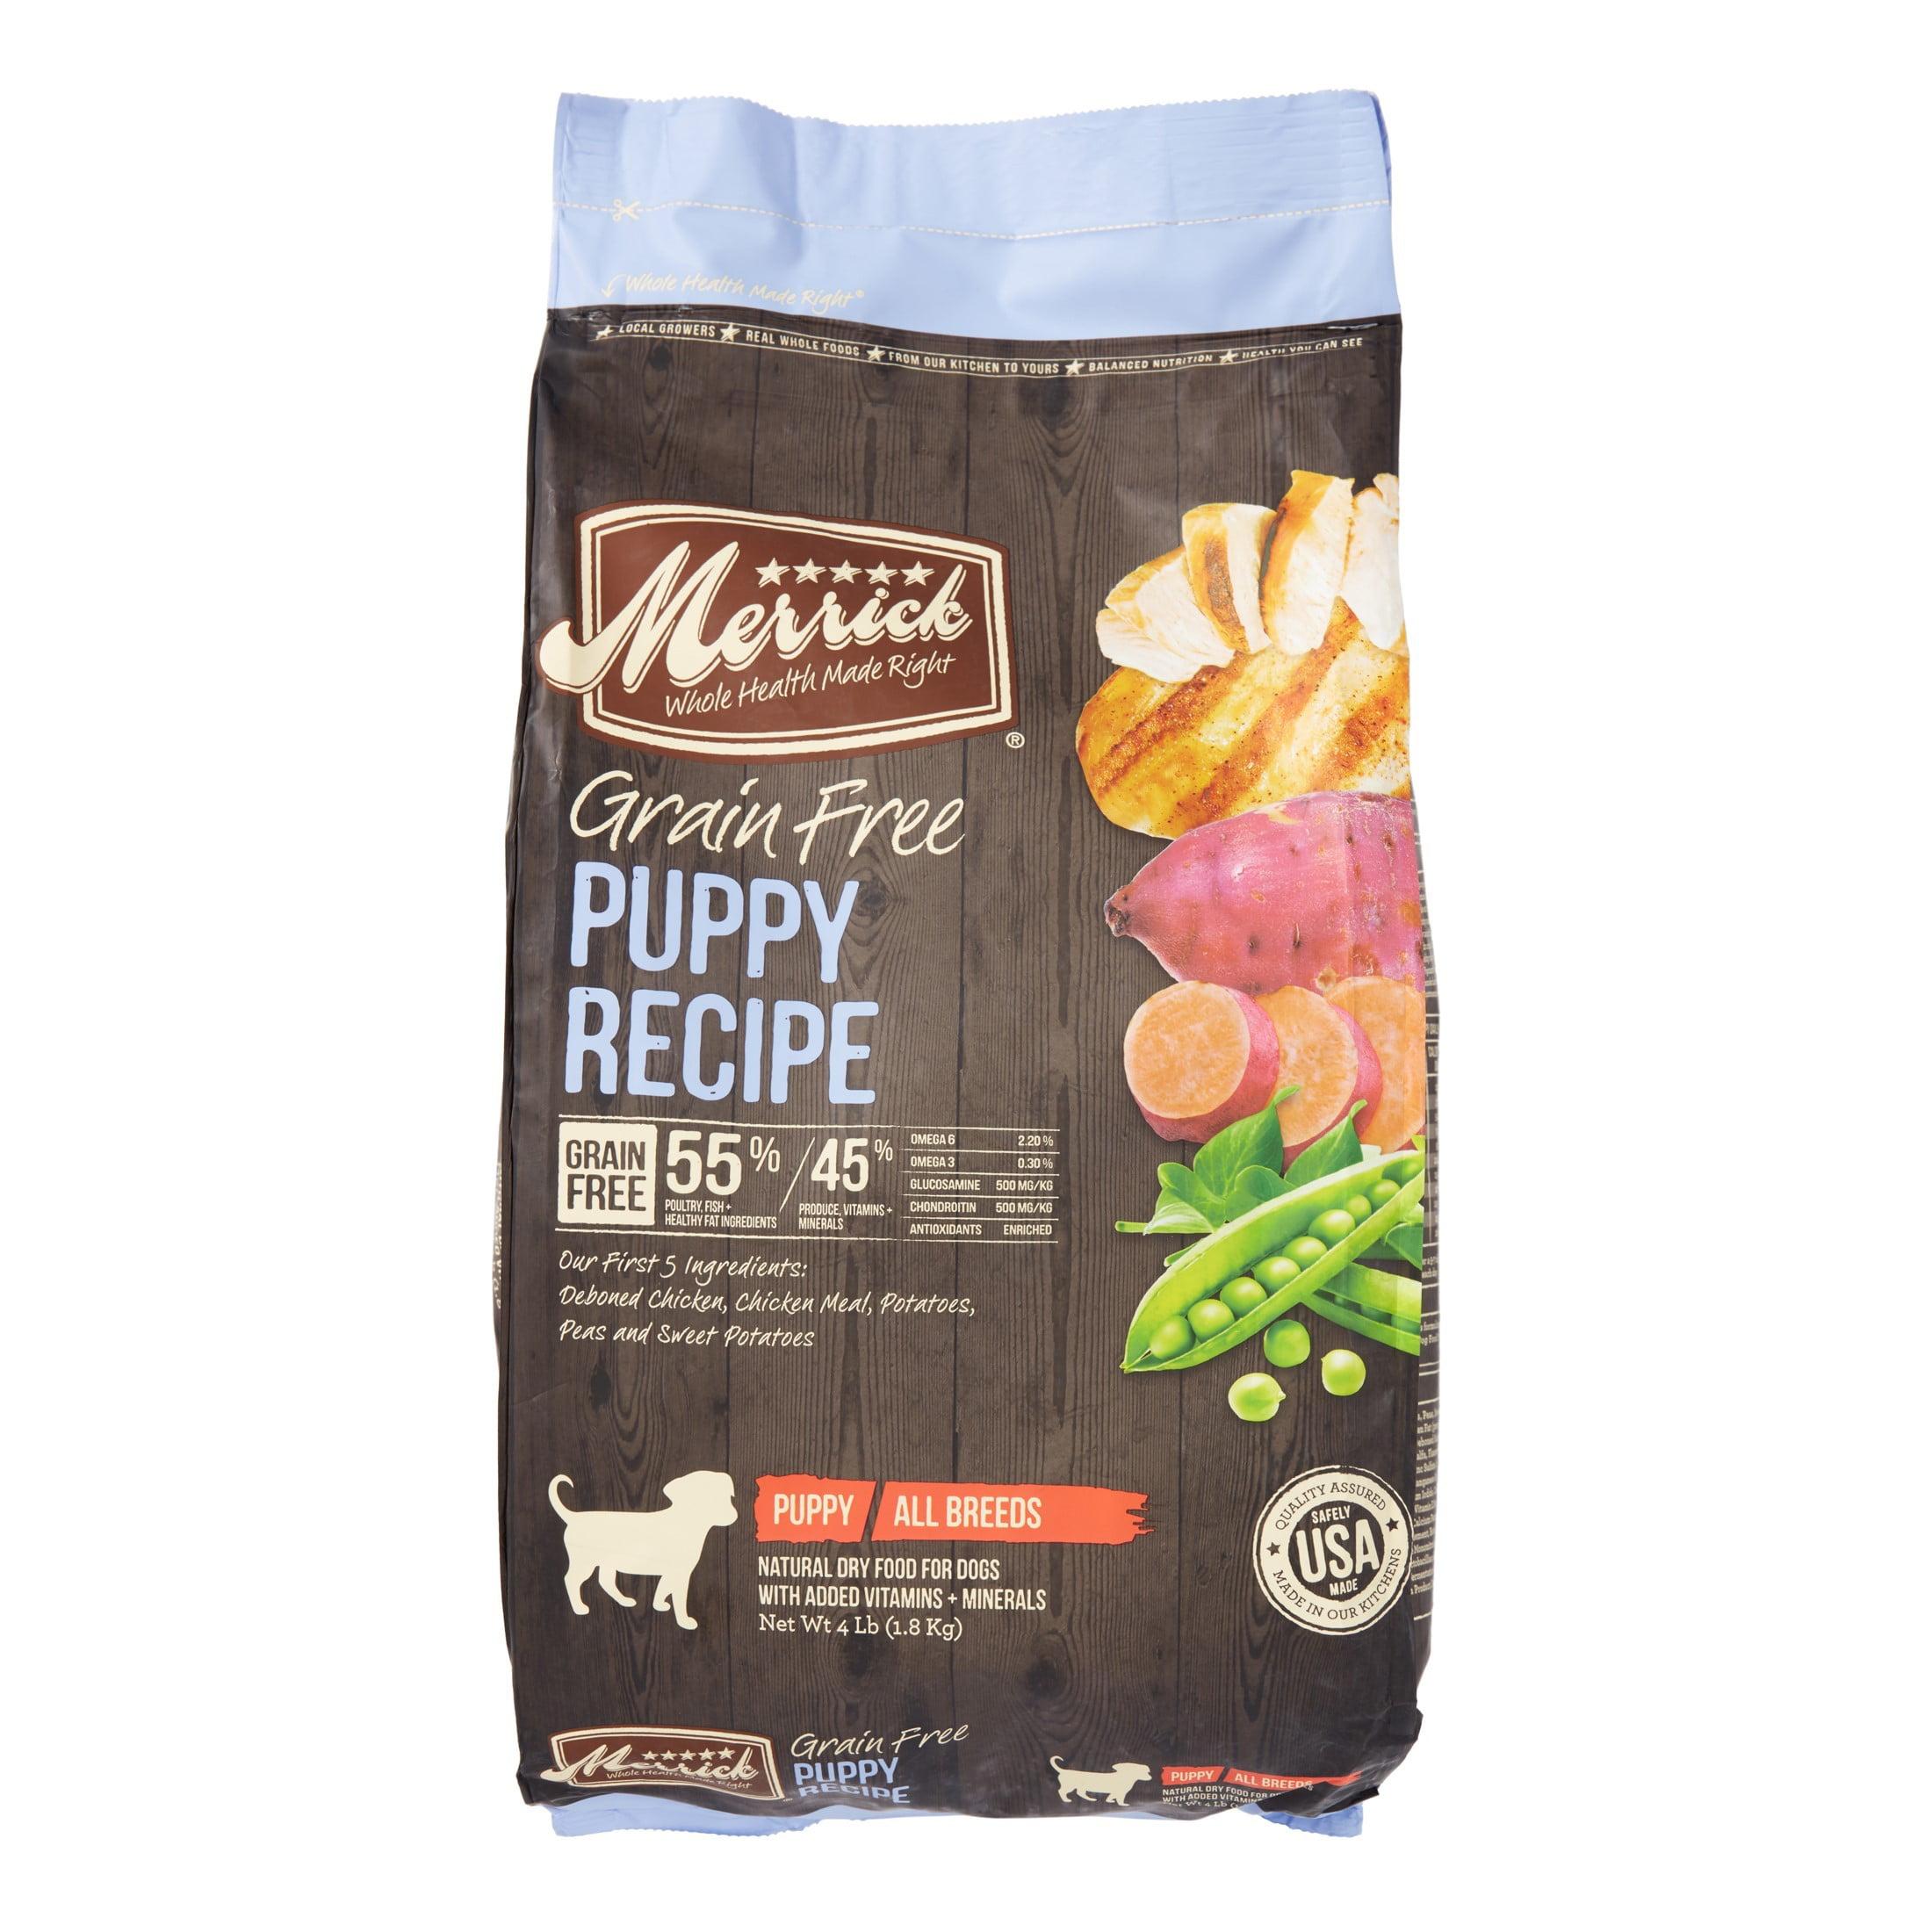 Merrick Grain-Free Puppy Recipe Dry Dog Food, 4lb